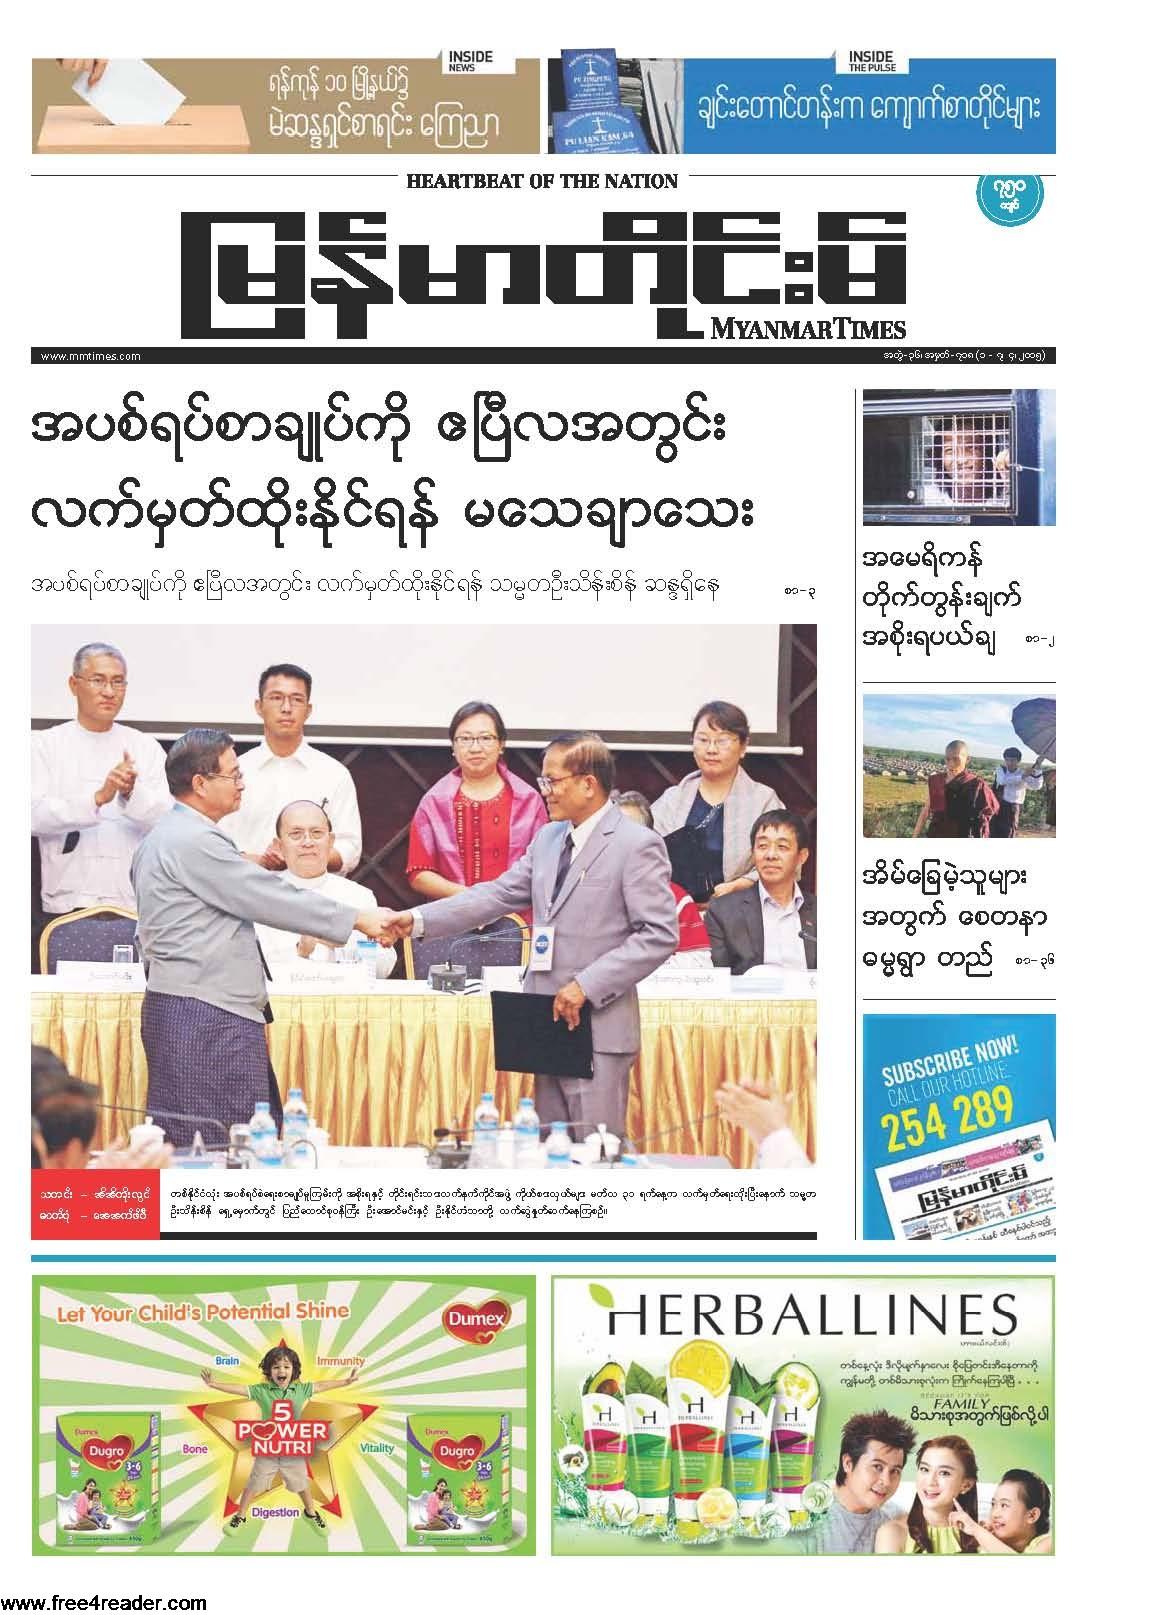 Myanmar Journals Free Download Home: Myanmar Times Journal Journal